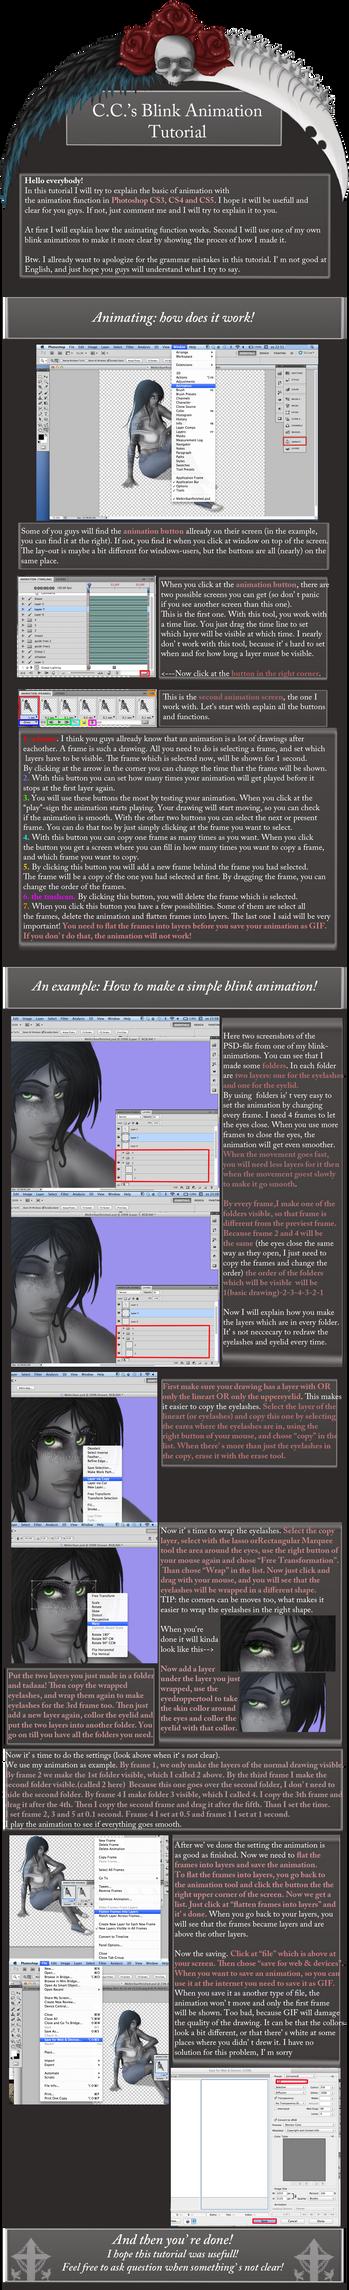 Blinking Animation Tutorial by CatCleopatra